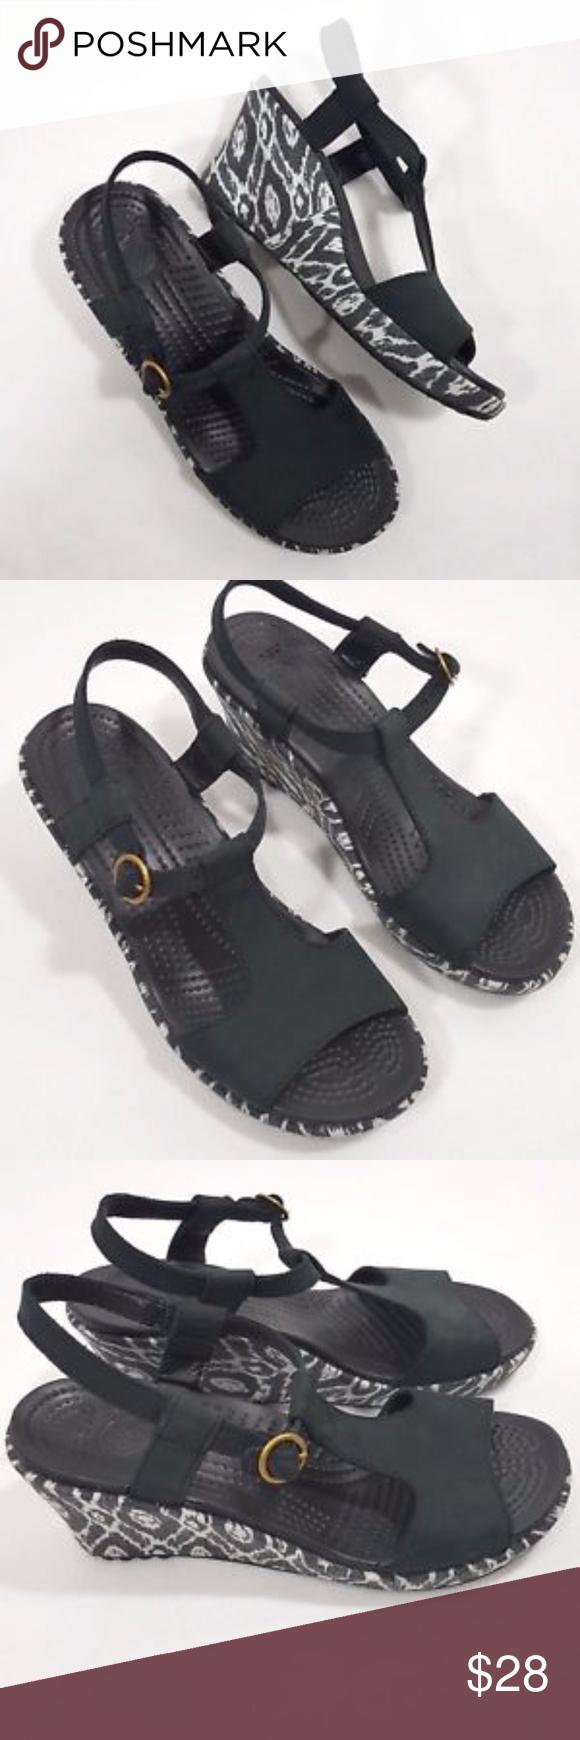 e1d436894e53 I just added this listing on Poshmark  CROCS Tribal Aztec Print Women s  Wedge Sandals.